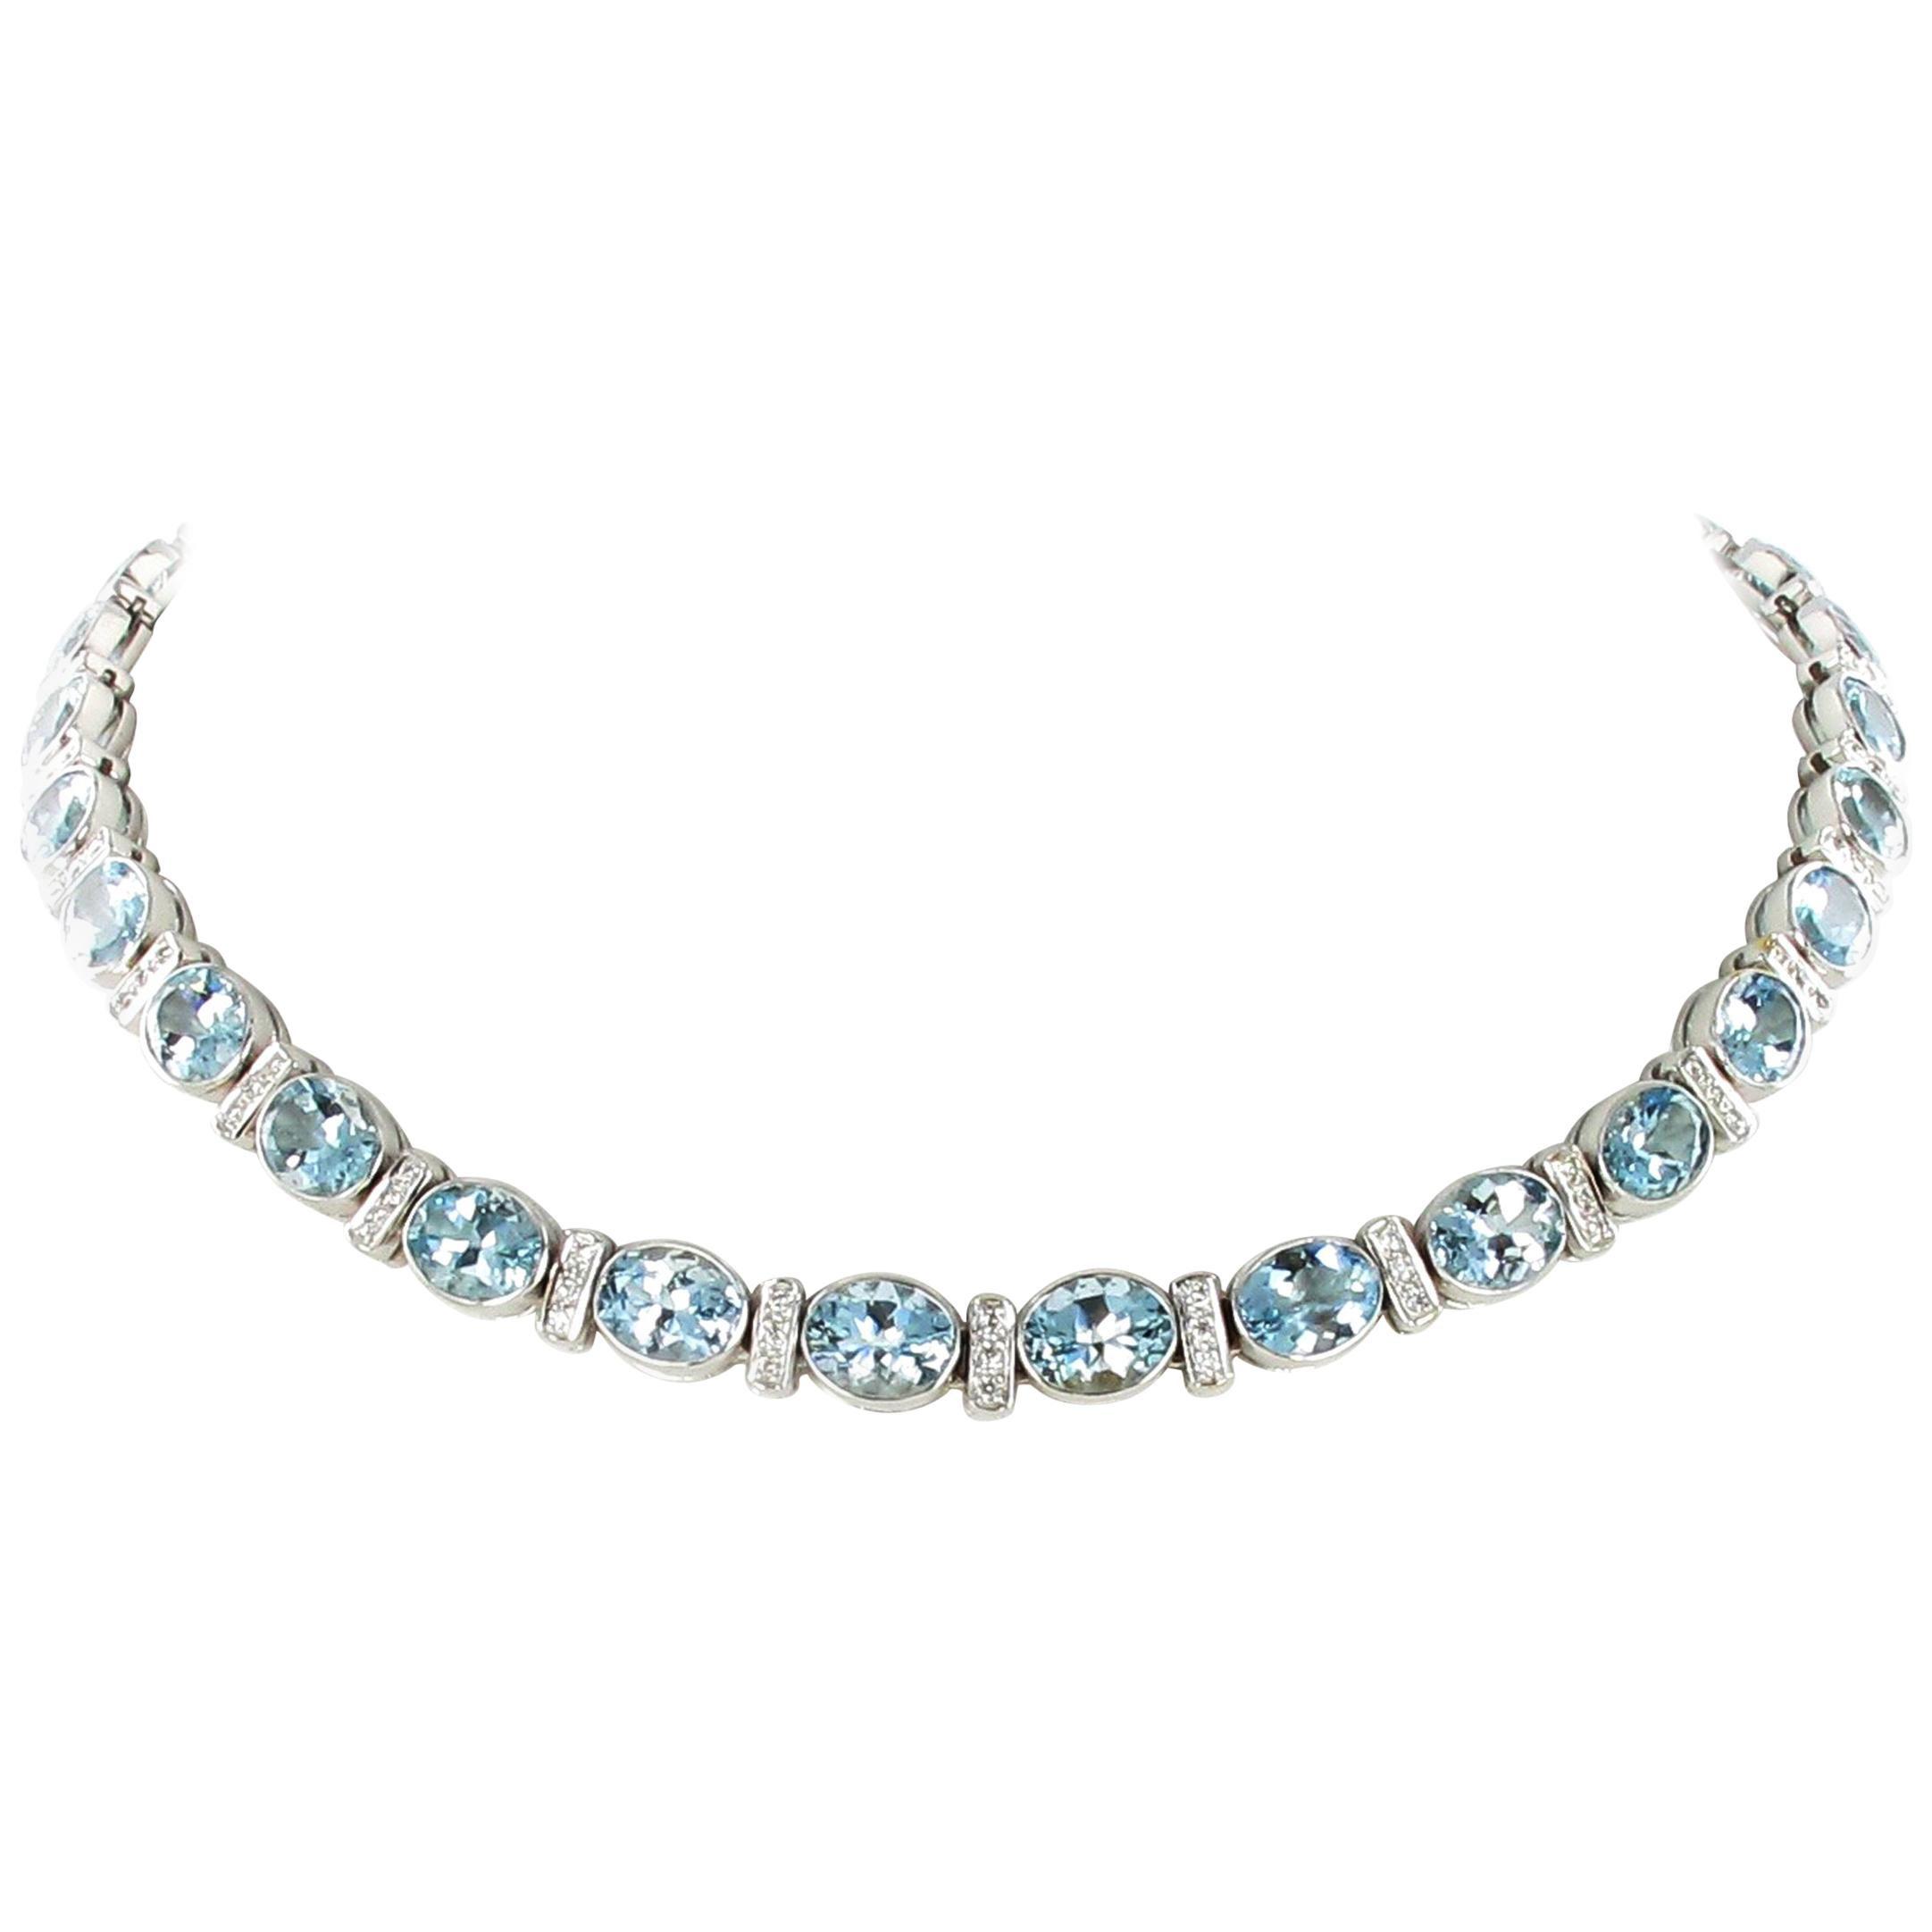 Aquamarine and Diamond Necklace in 18 Karat White Gold